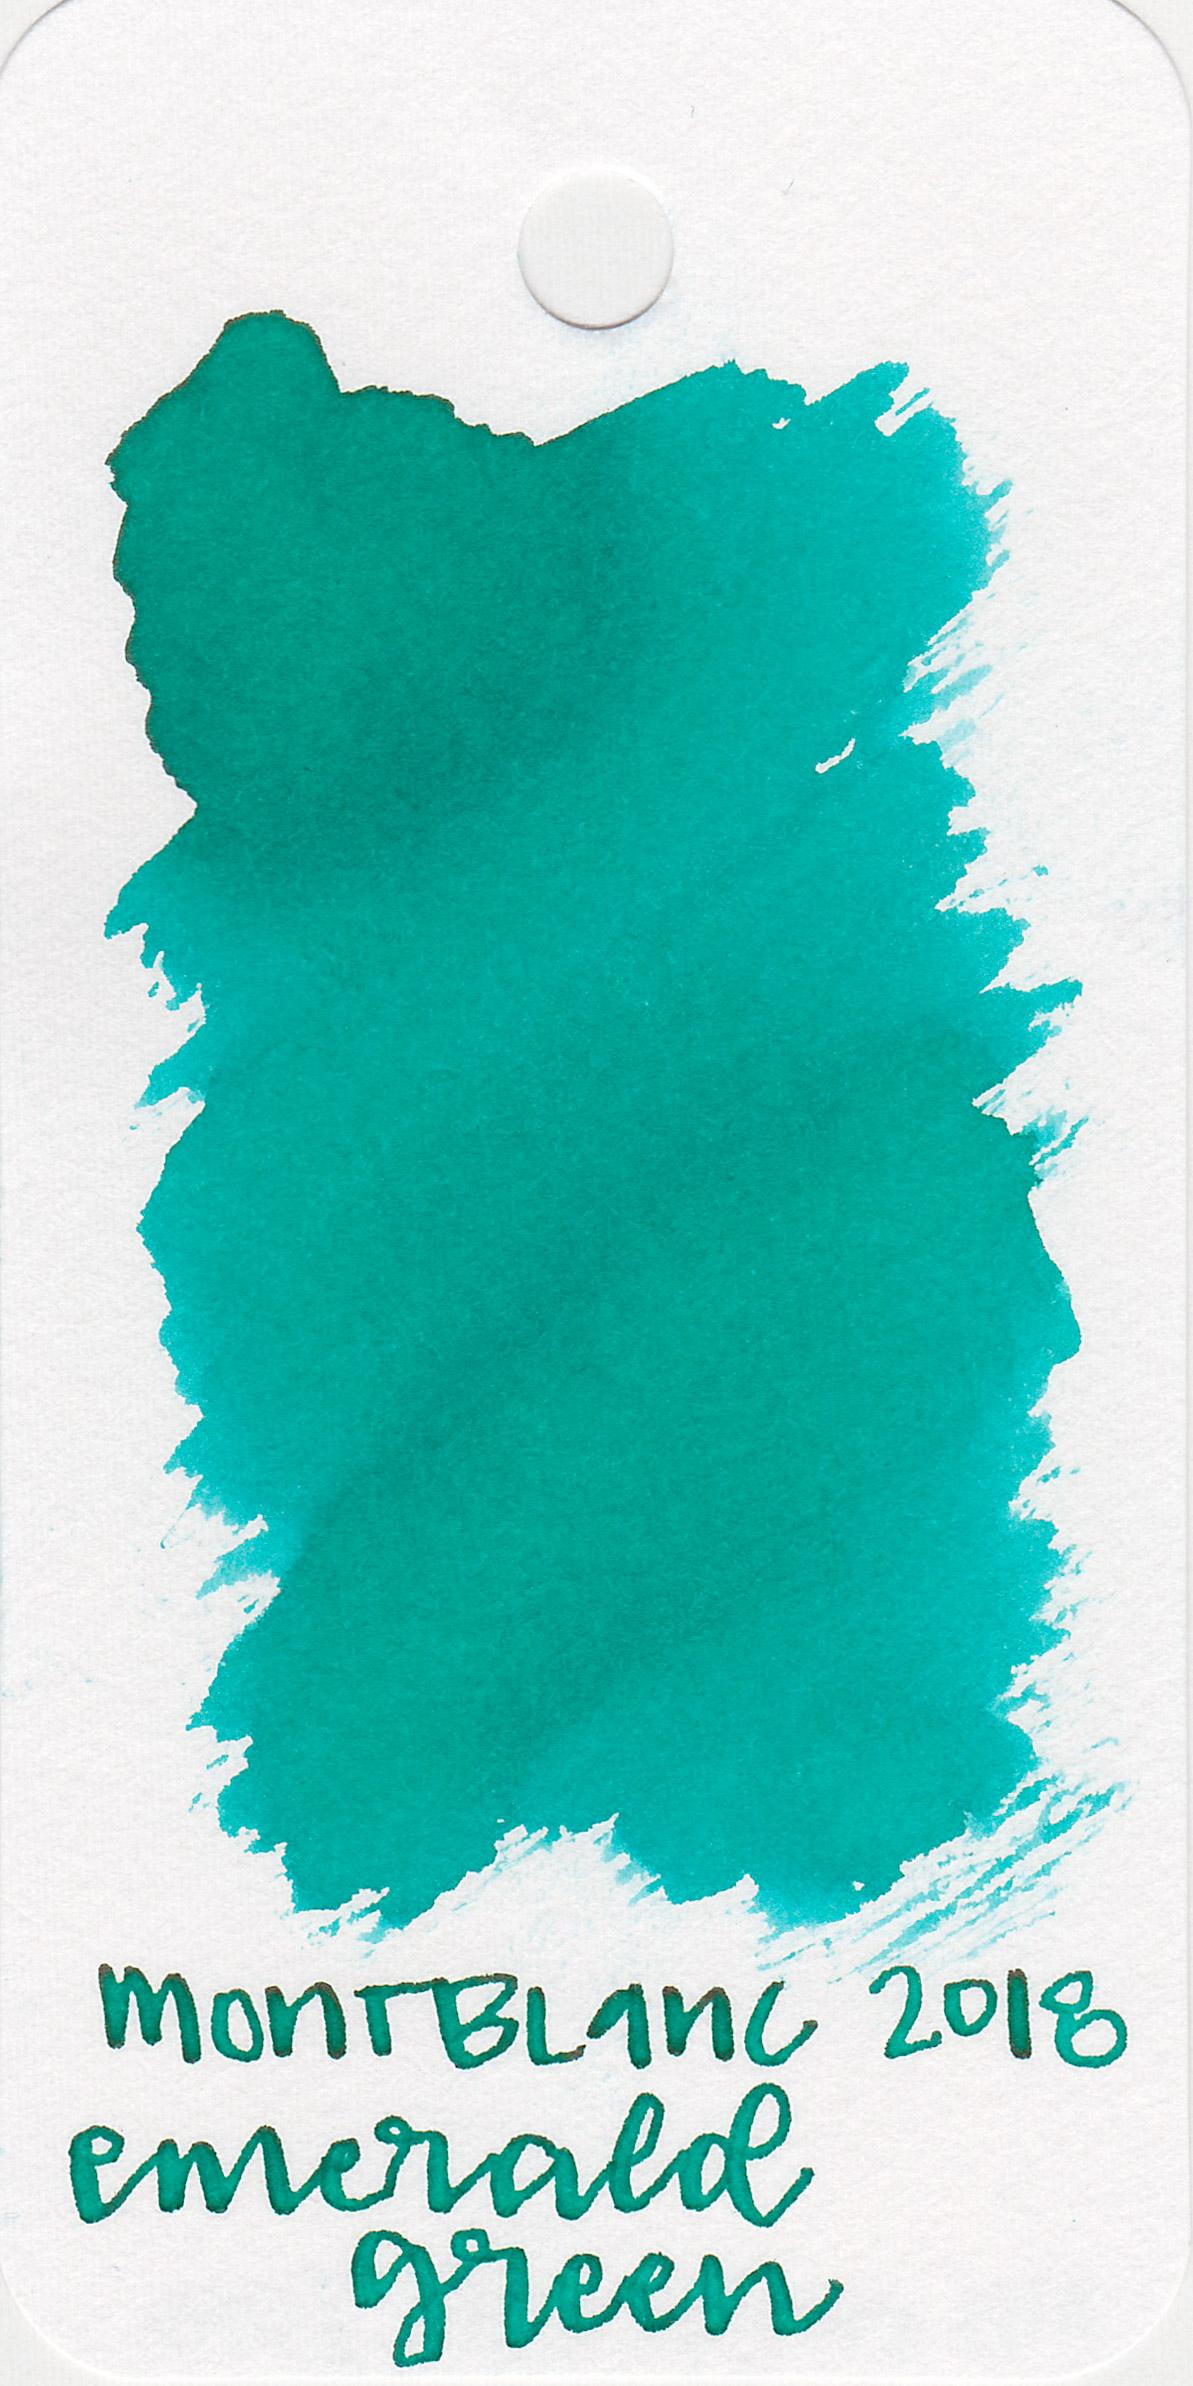 mb-emerald-green-1.jpg